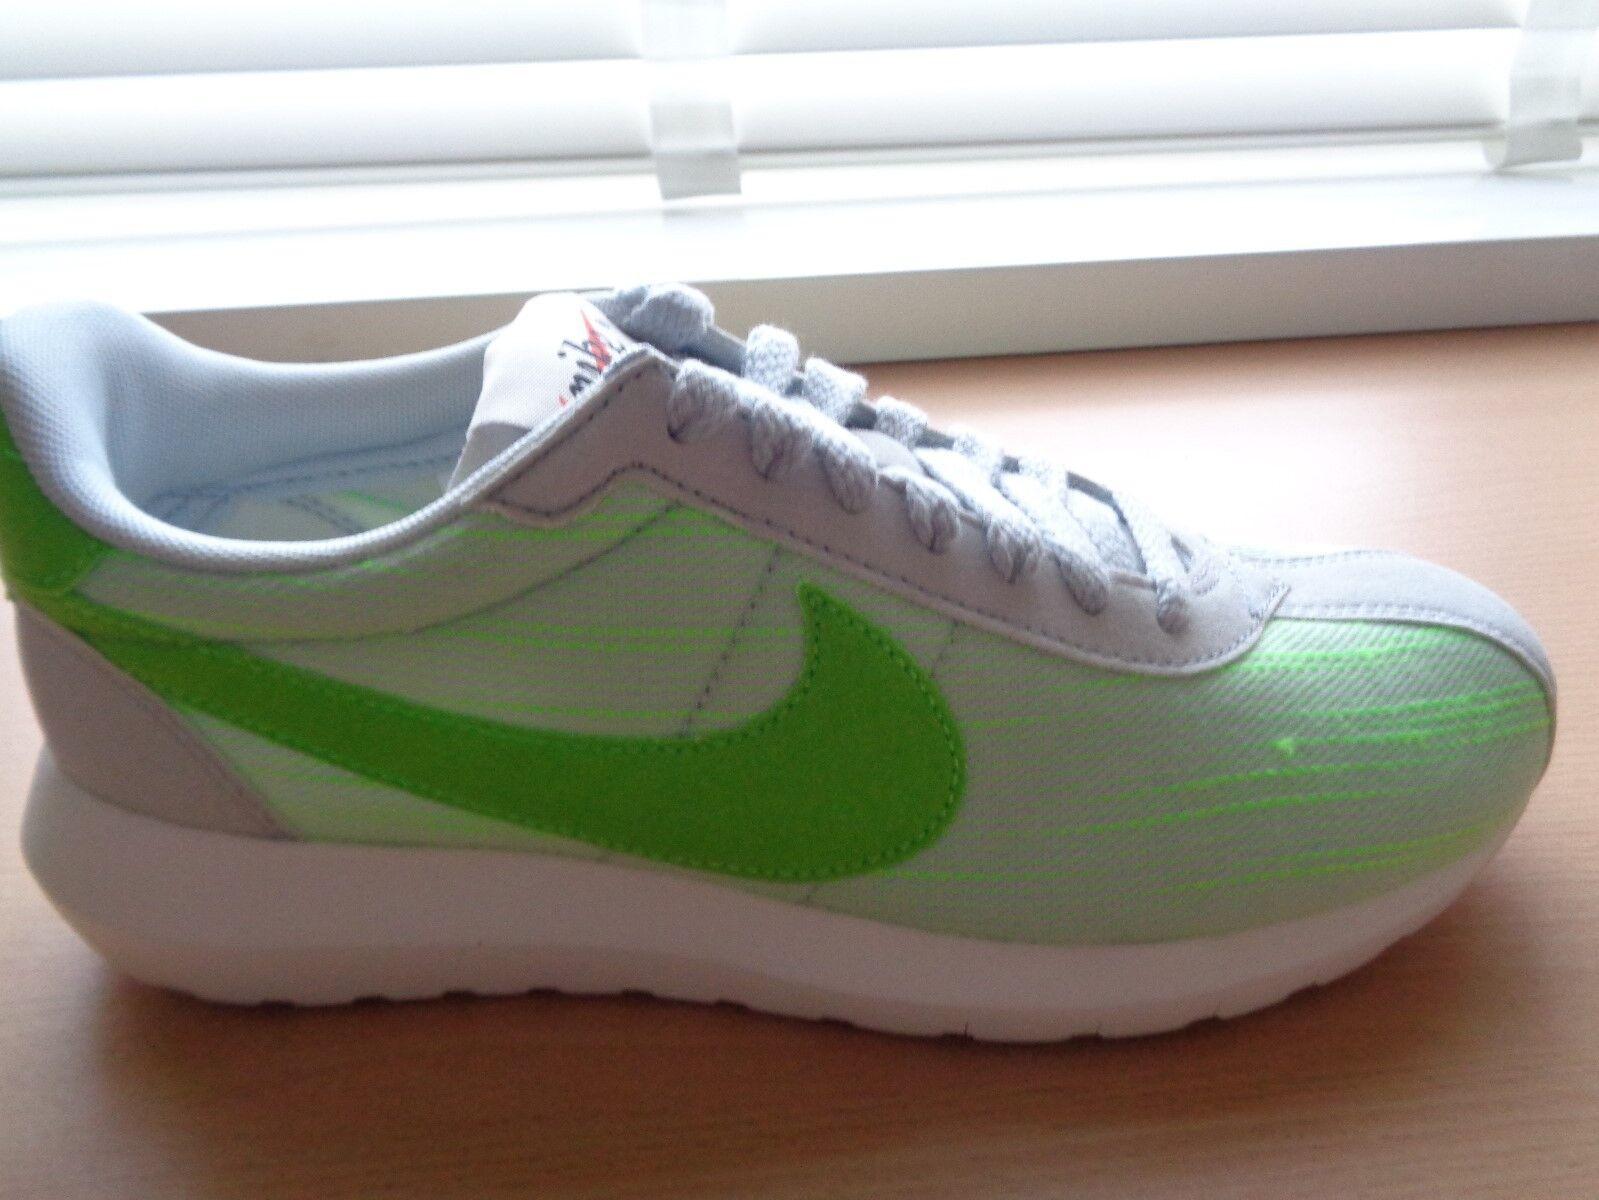 3ed17b3745d4a1 ... Nike roshe LD-1000 chaussures chaussures chaussures femme baskets  baskets 819843 004 eu 37.5 us ...